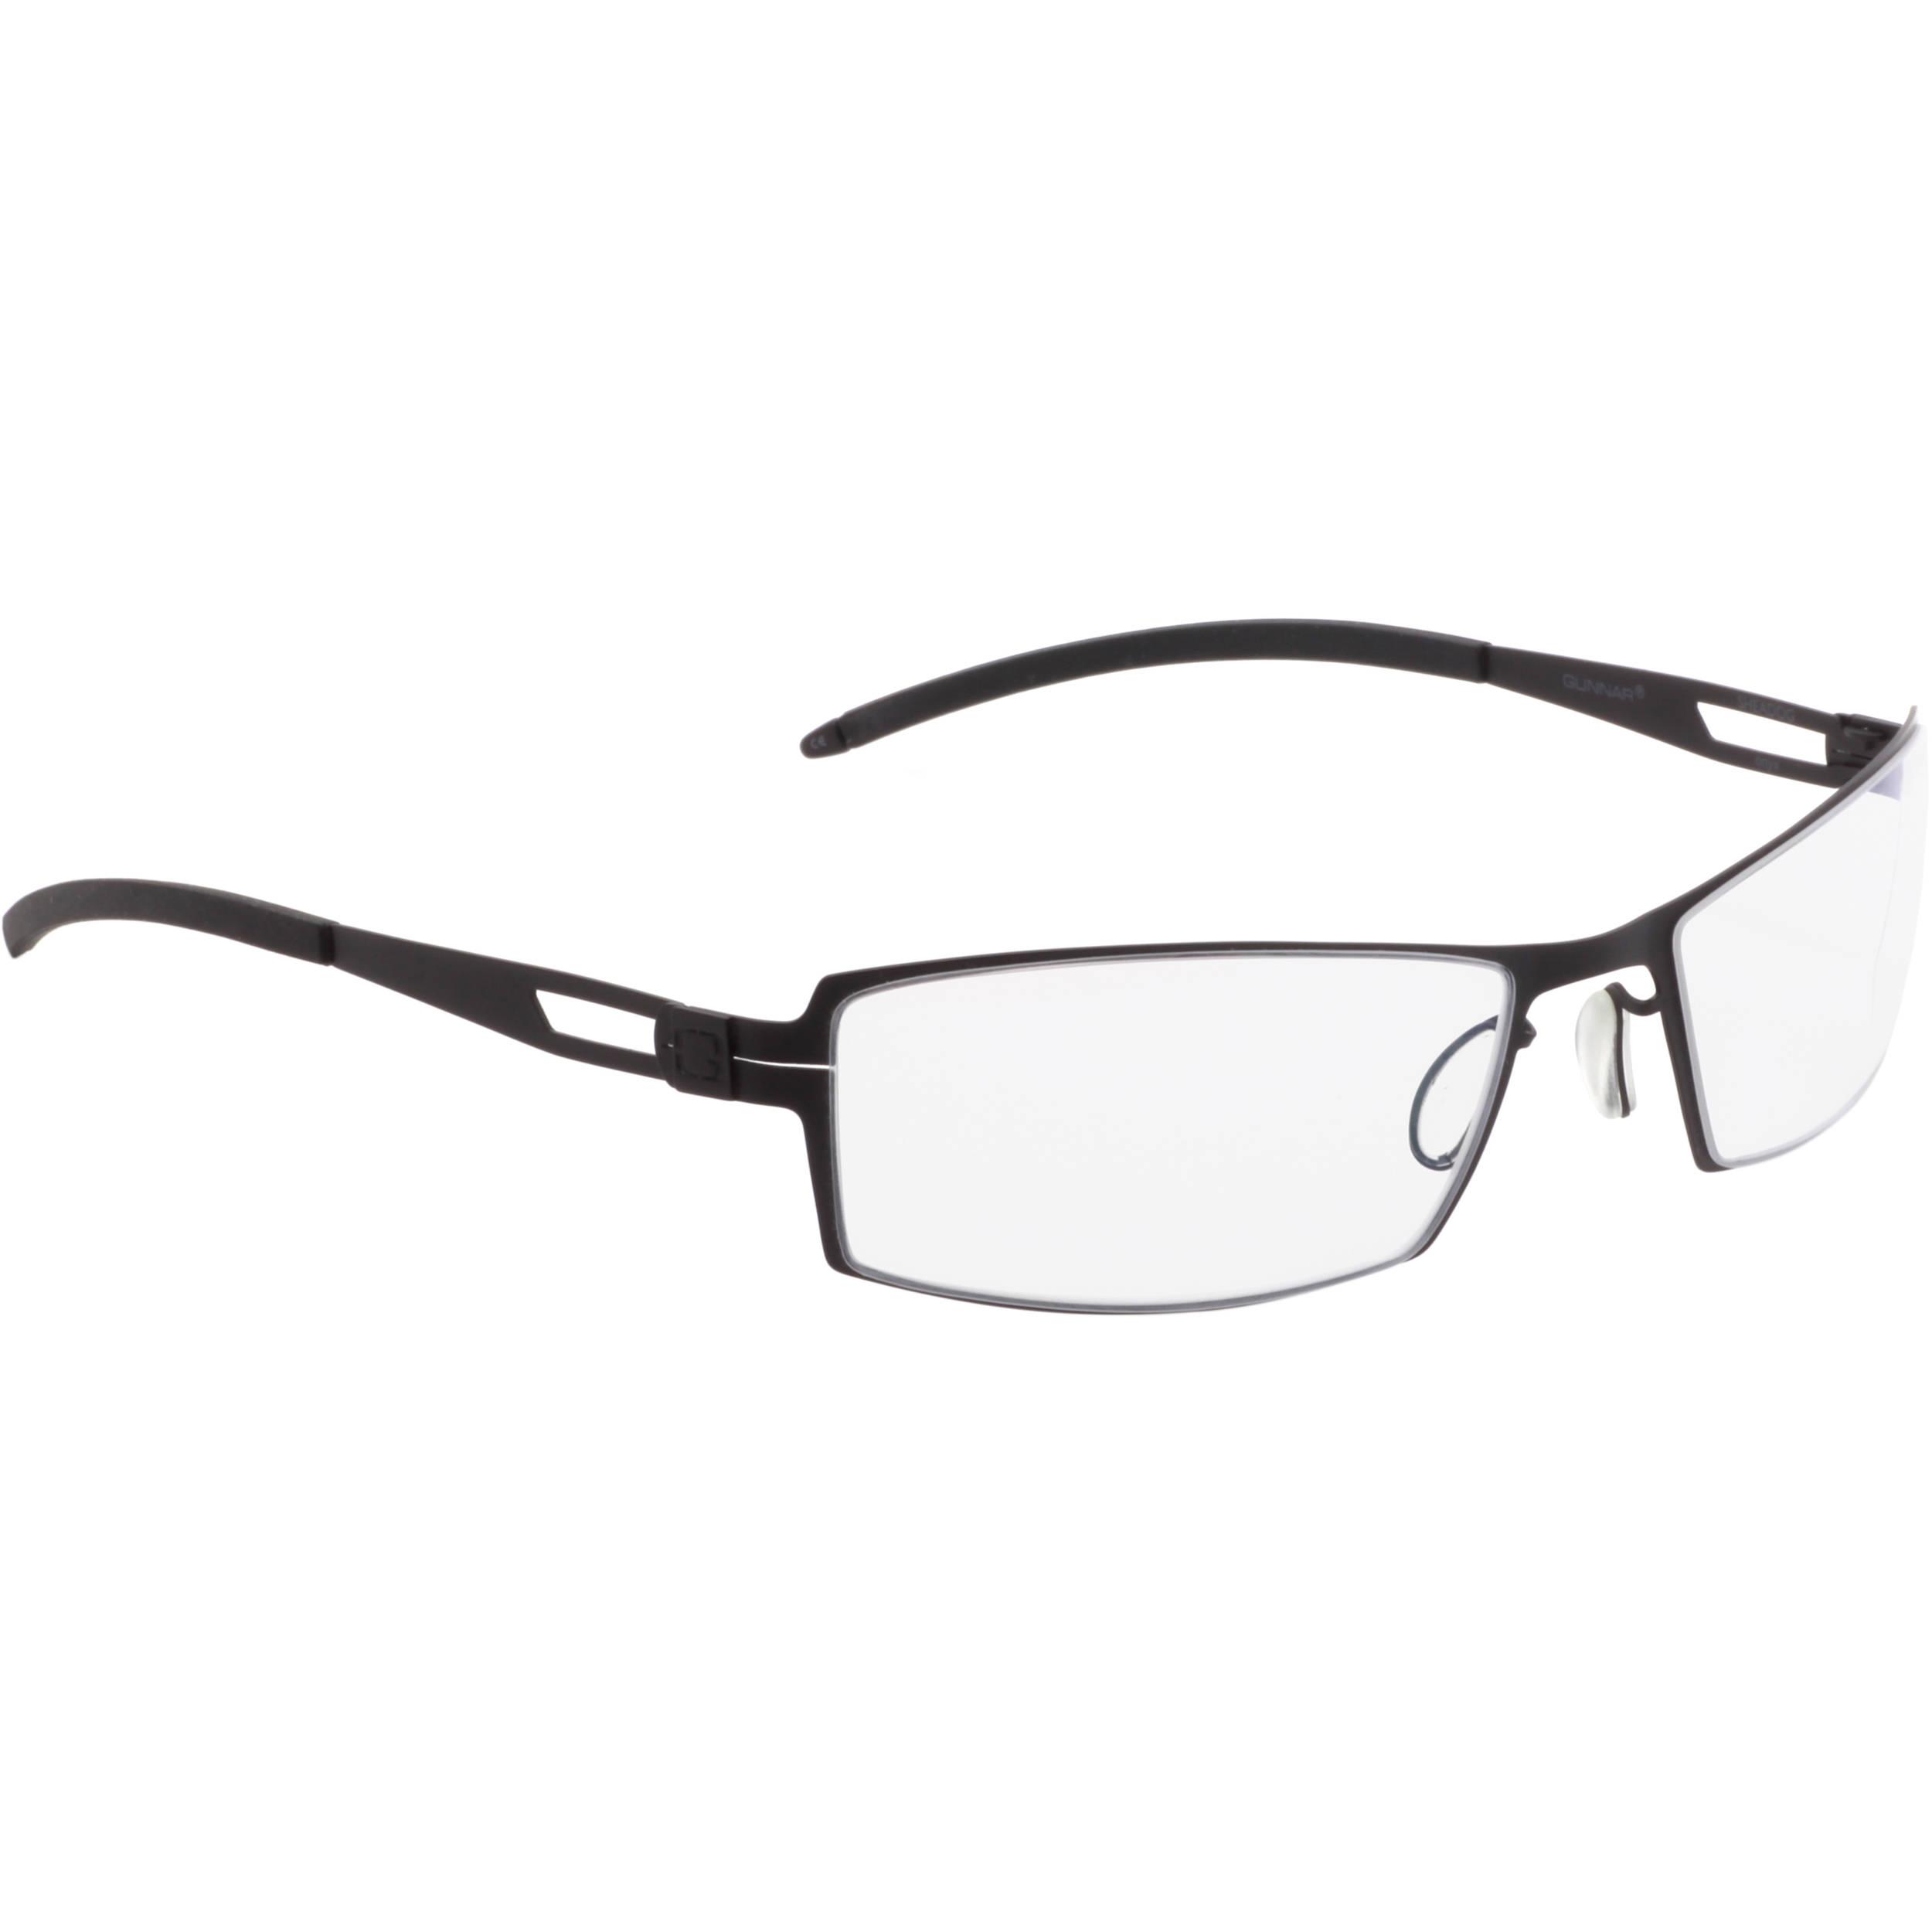 GUNNAR Sheadog Computer Glasses G0005-C00103 B&H Photo Video